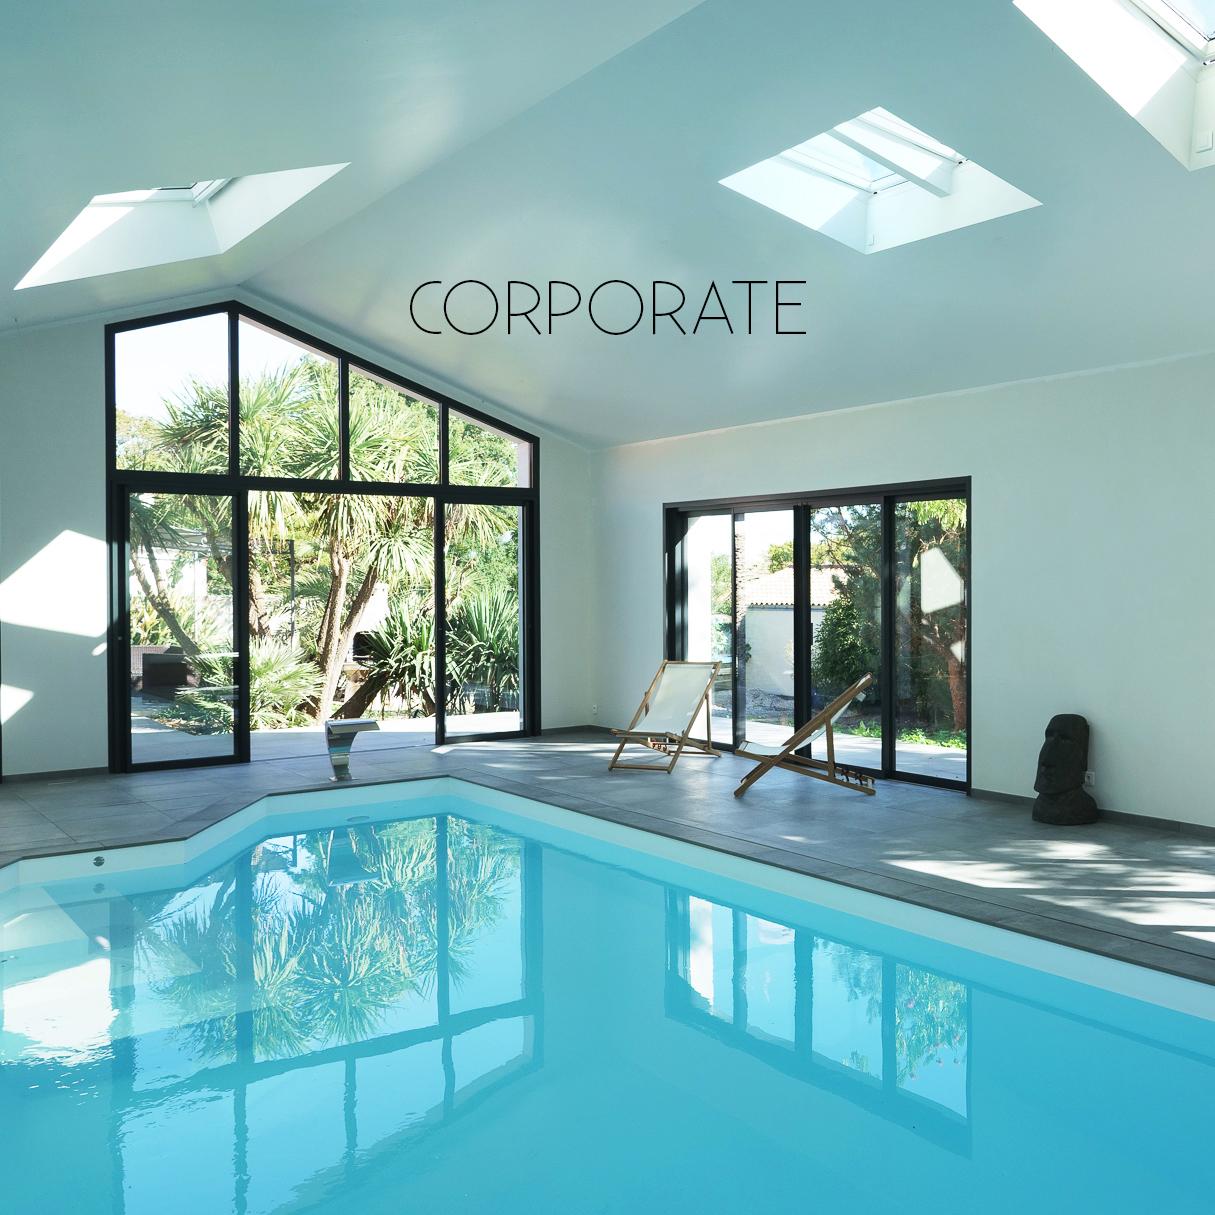 Photographe entreprise et corporate - piscine et hotel - Elise Fournier Photographe